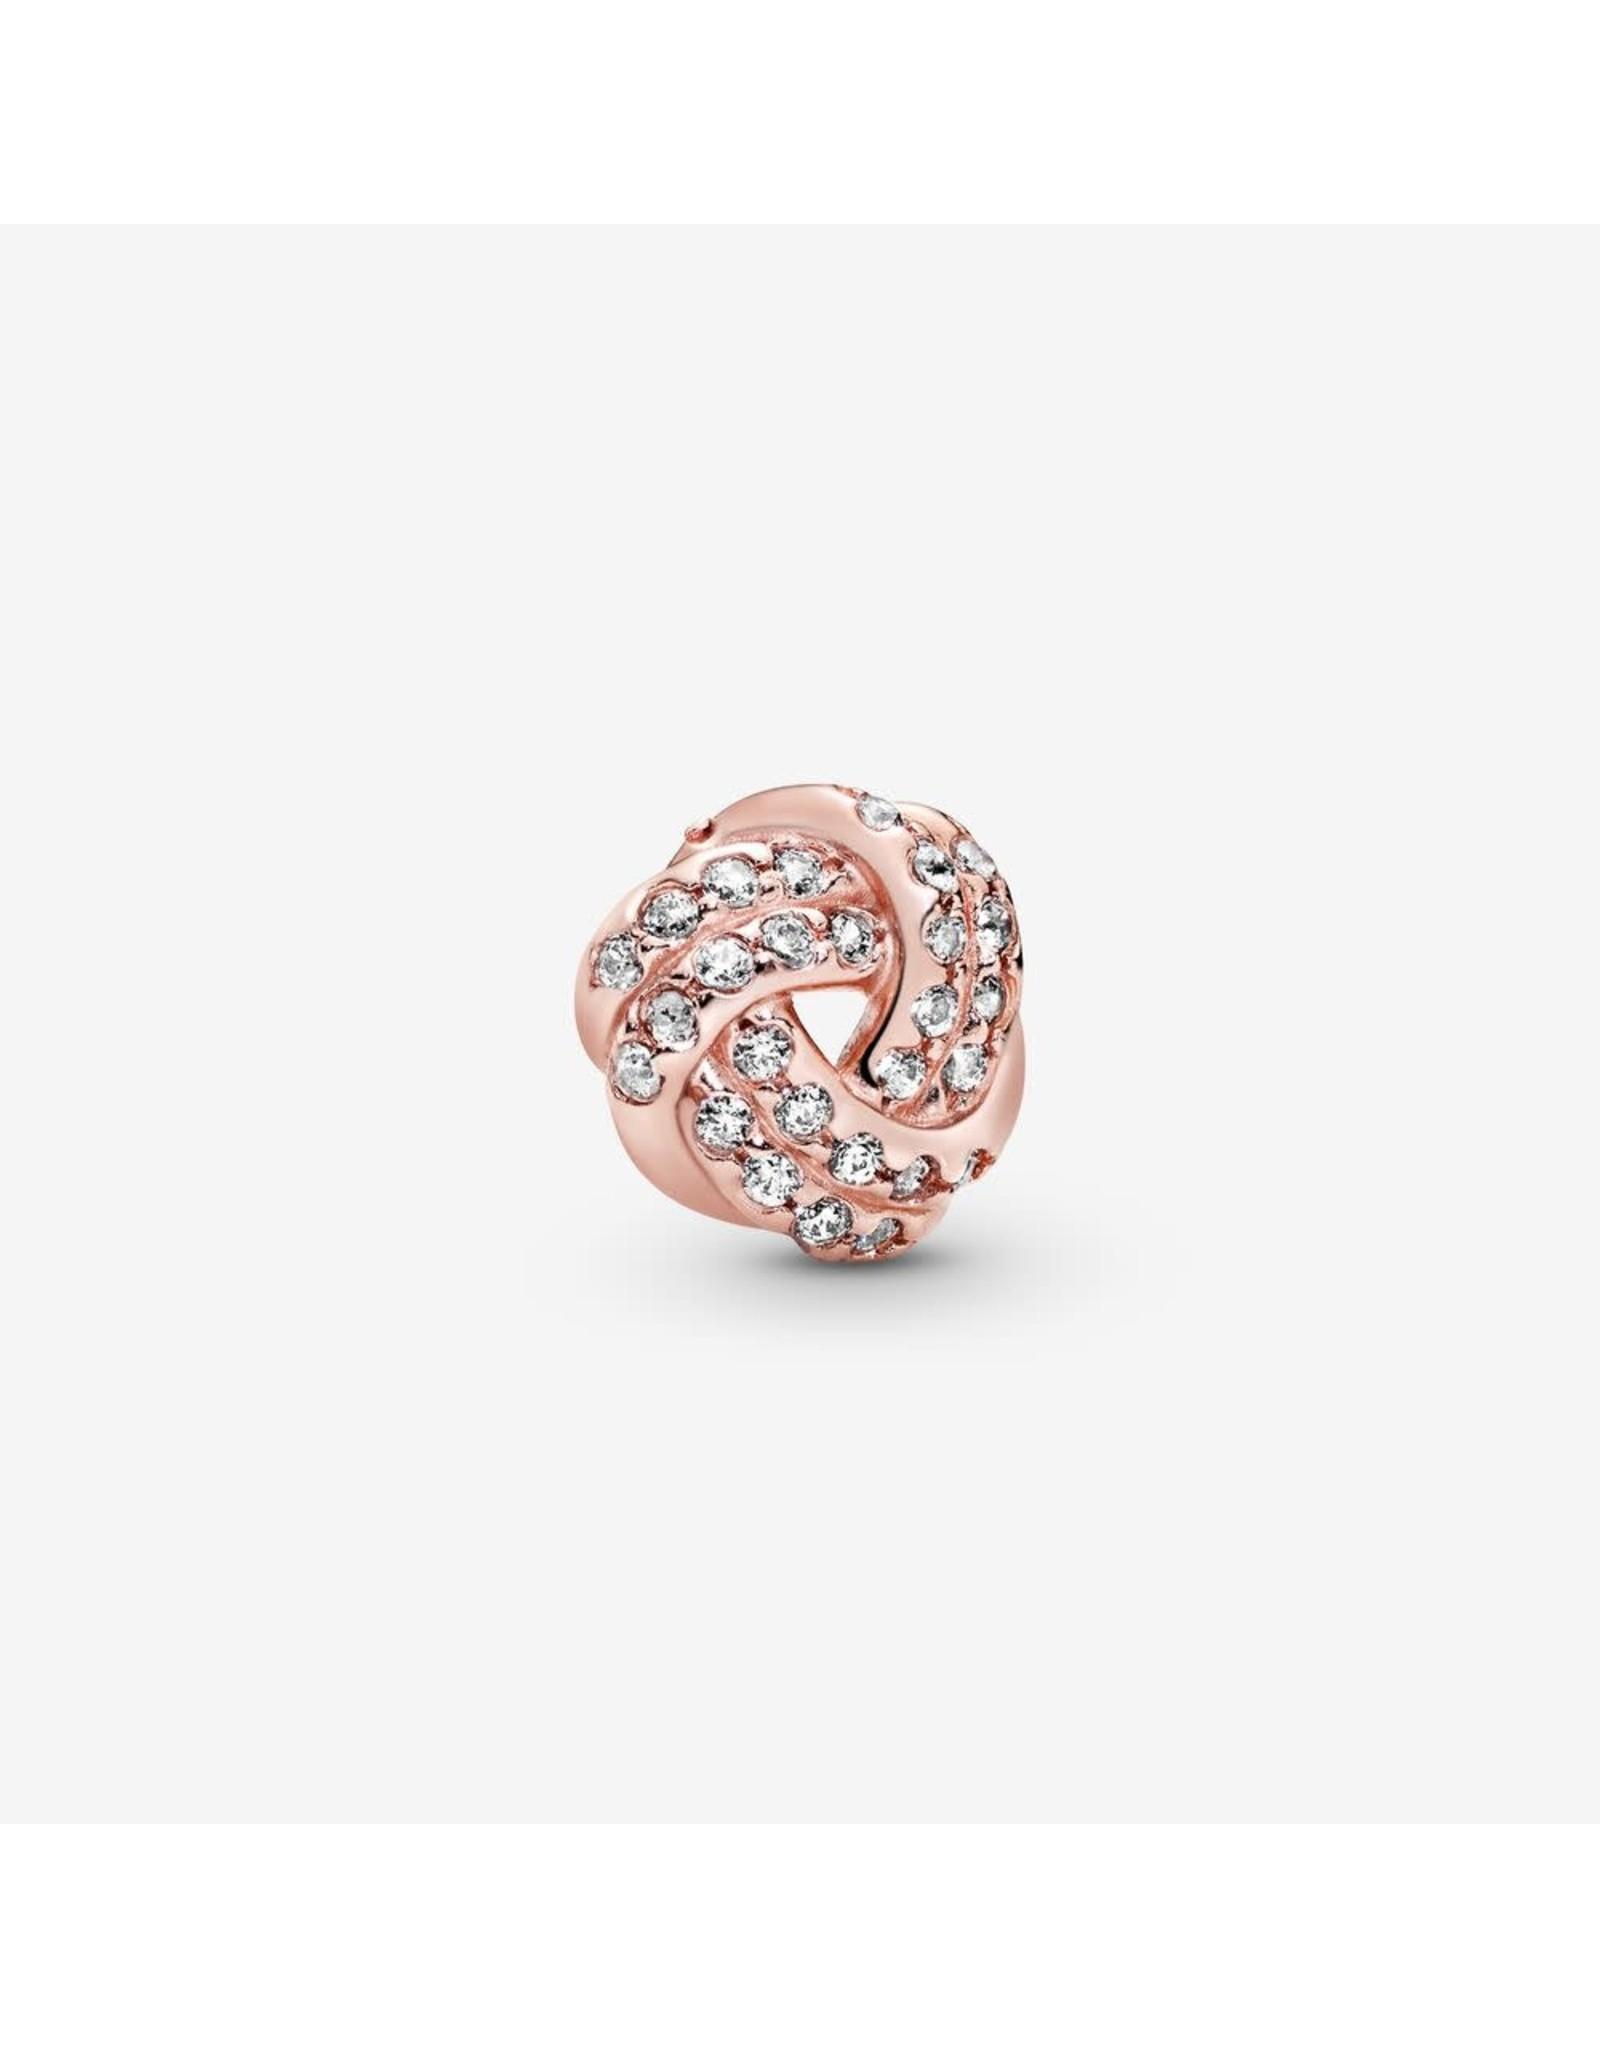 Pandora Pandora Petite Charm, Rose Gold, Sparkling Love Knot, Clear CZ